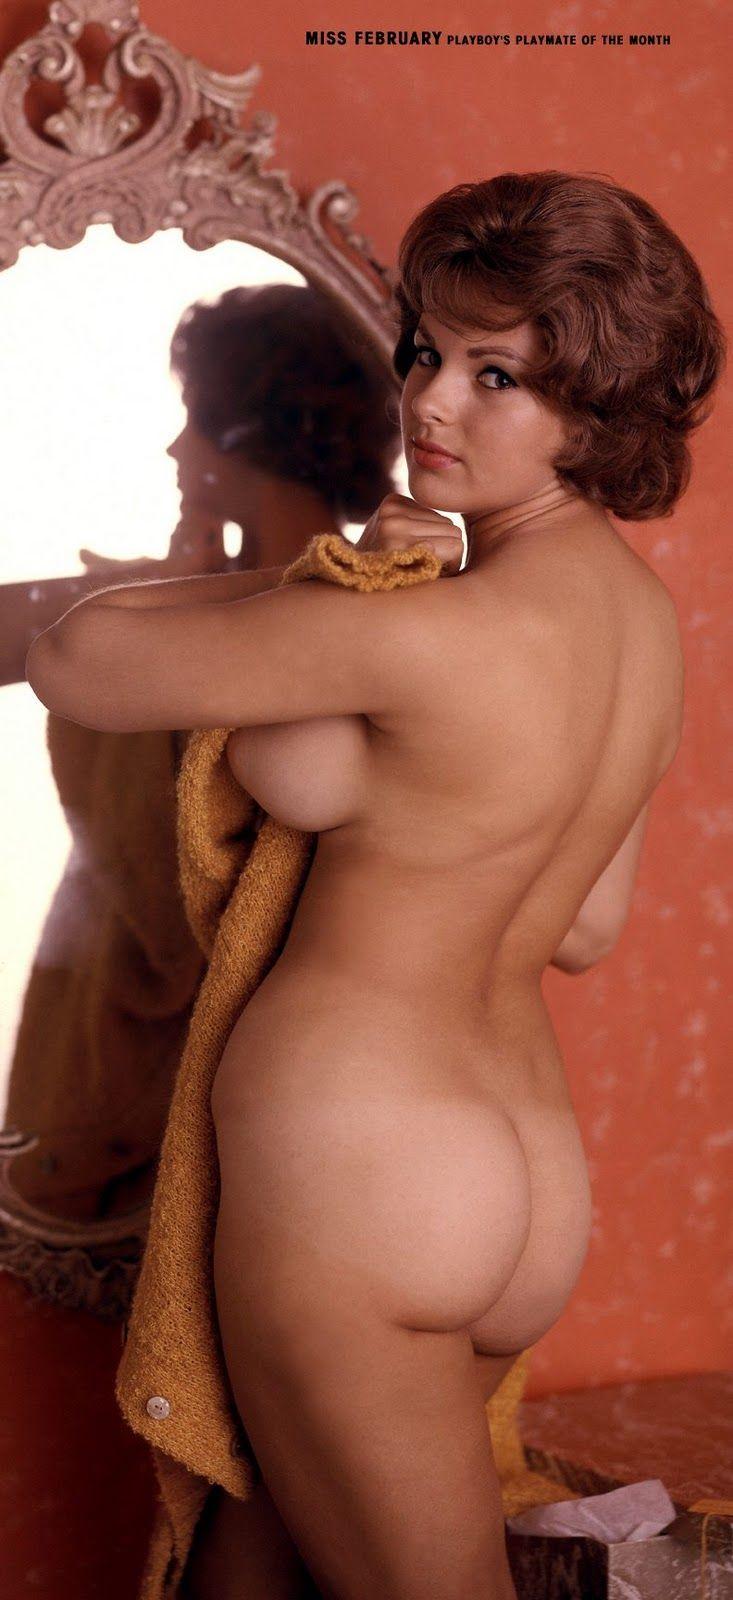 Alison Waite Nude 1966 playboy playmates - megapornx